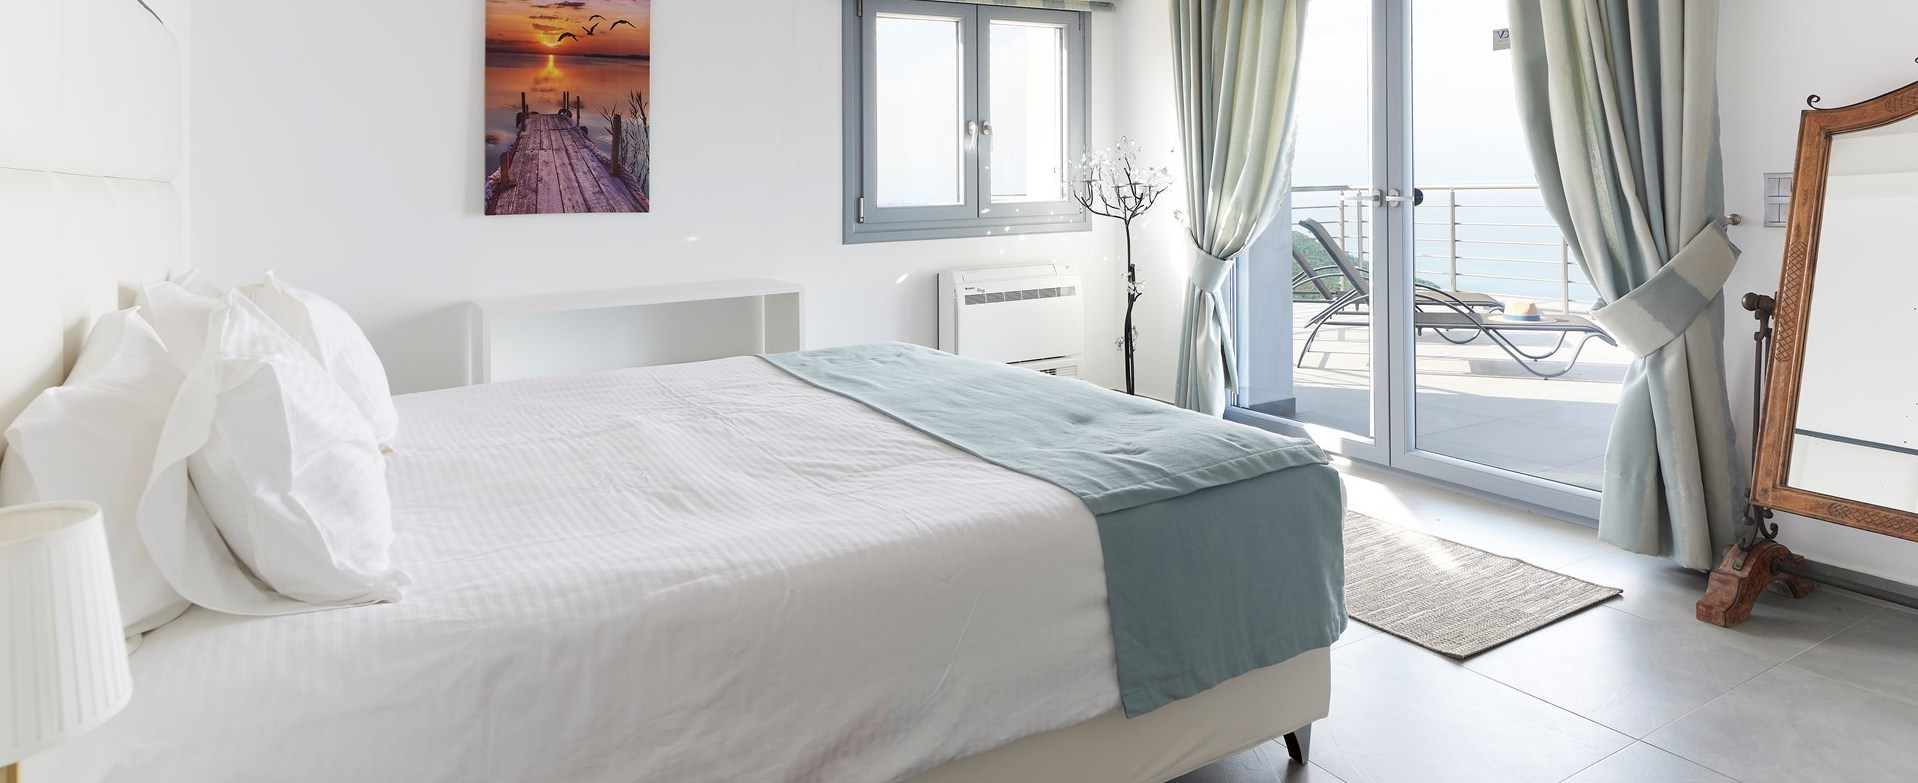 luxury-corfu-villa-master-bedroom